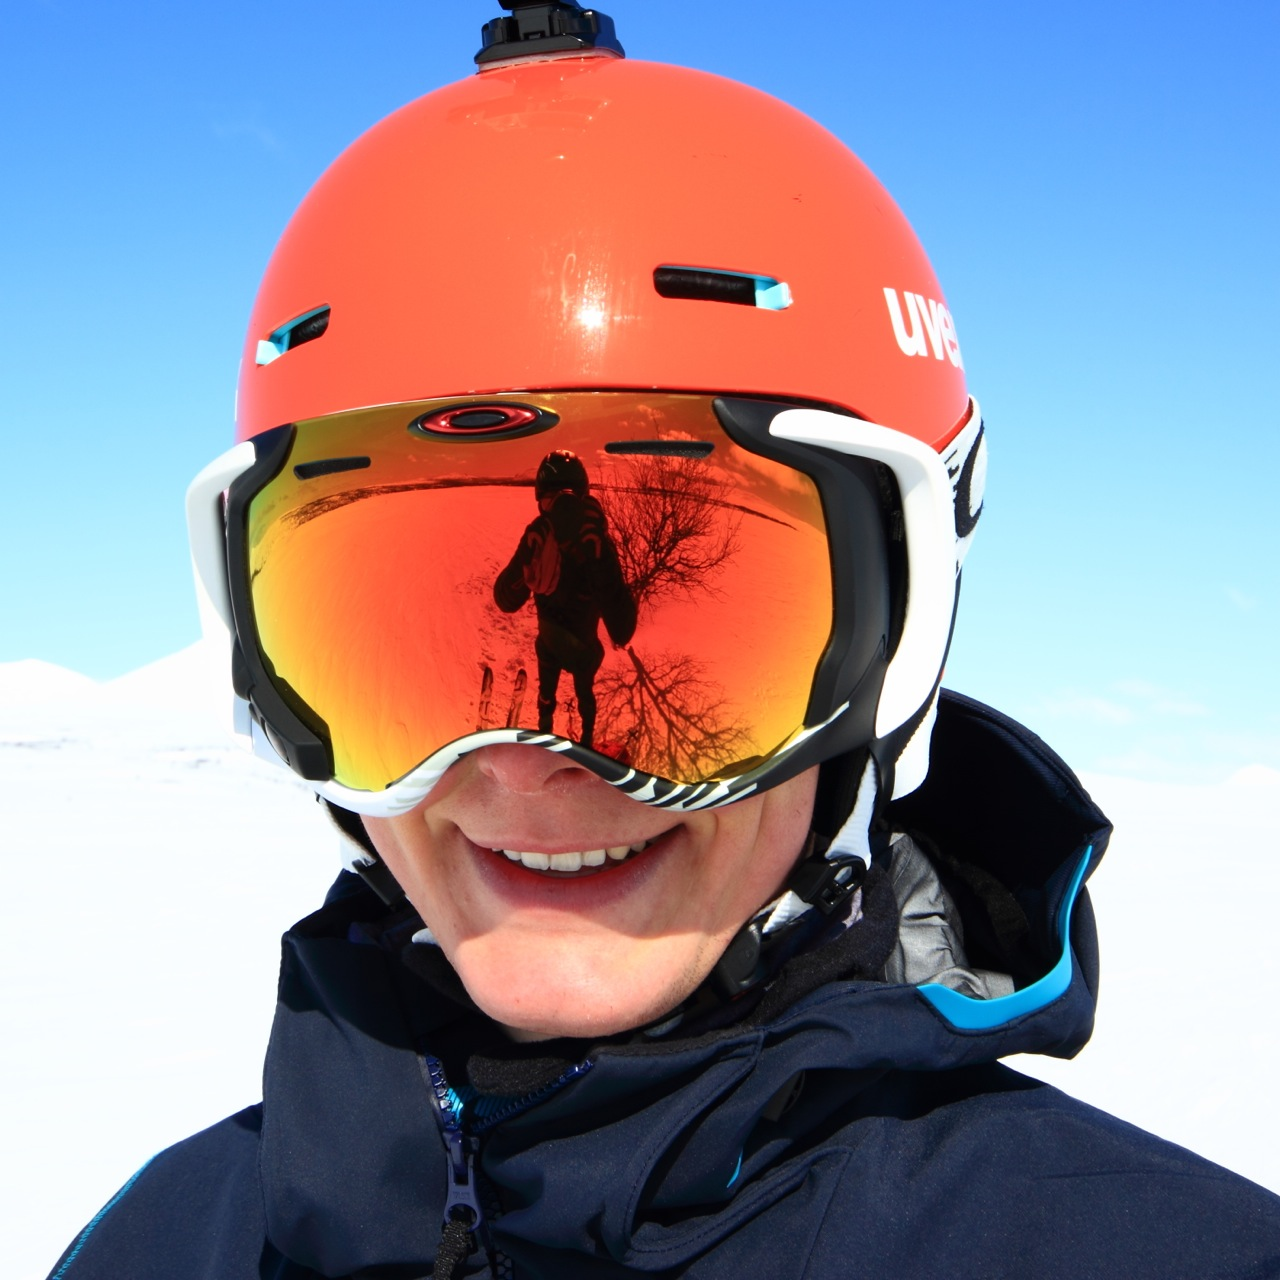 oakley airwave goggles  Tested: Oakley Airwave 1.5